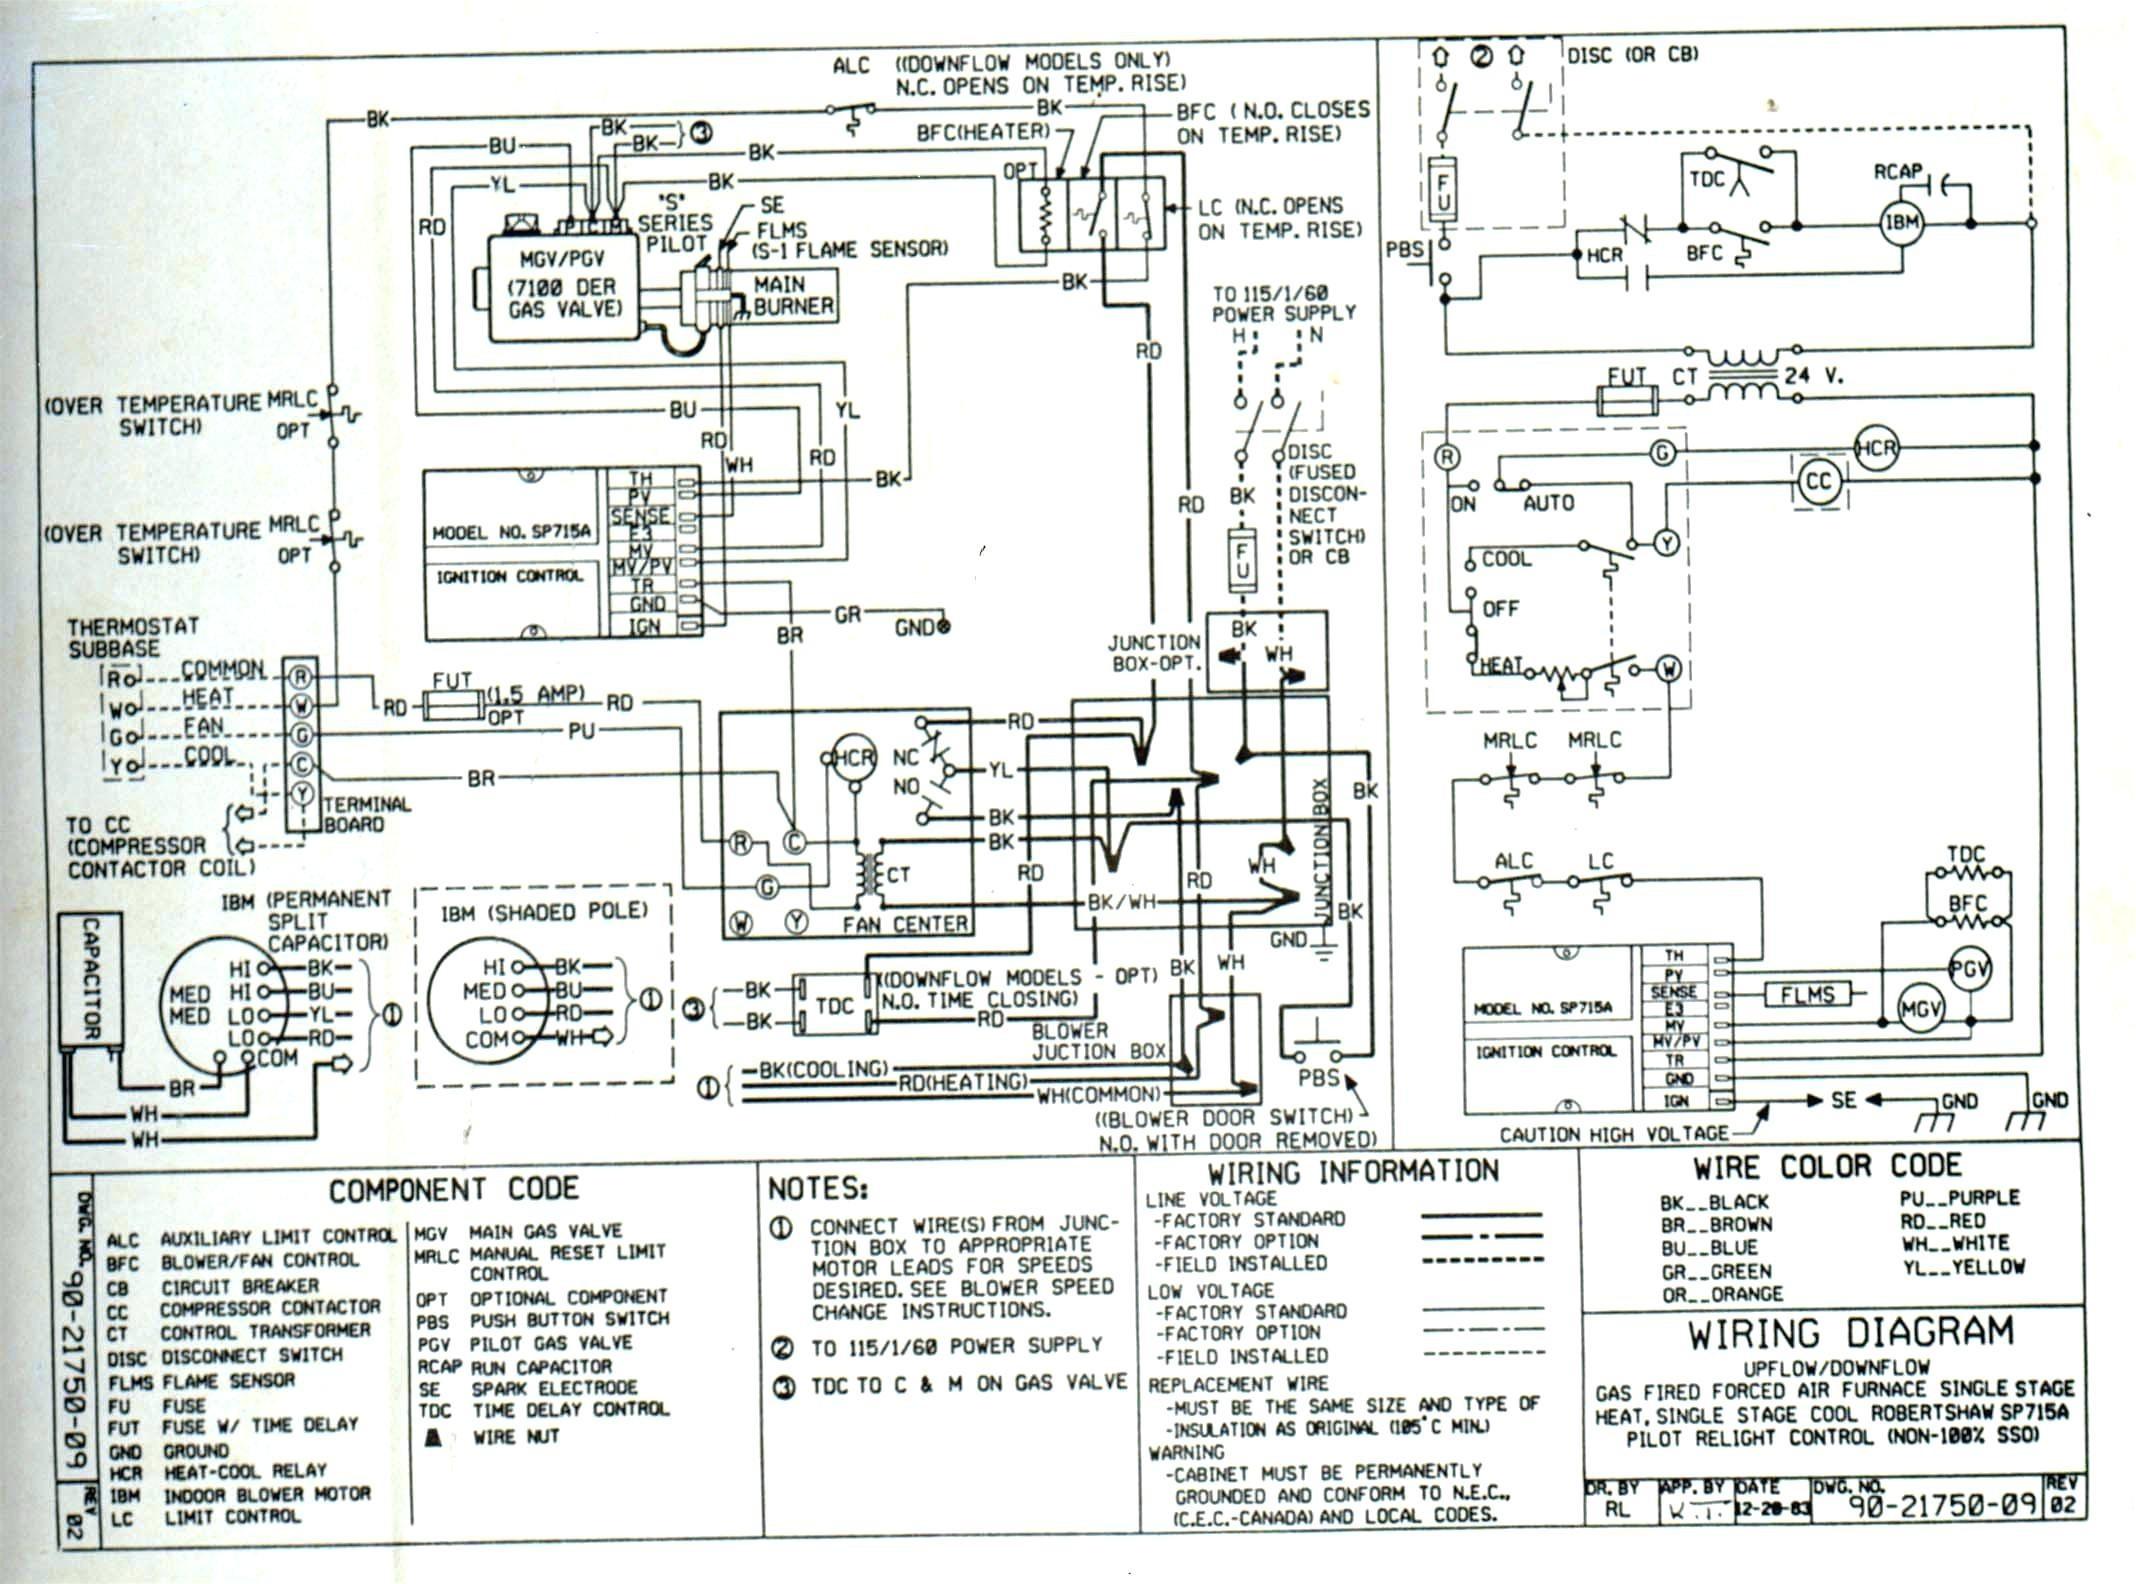 Trane Xl Heat Pump Wiring Diagram